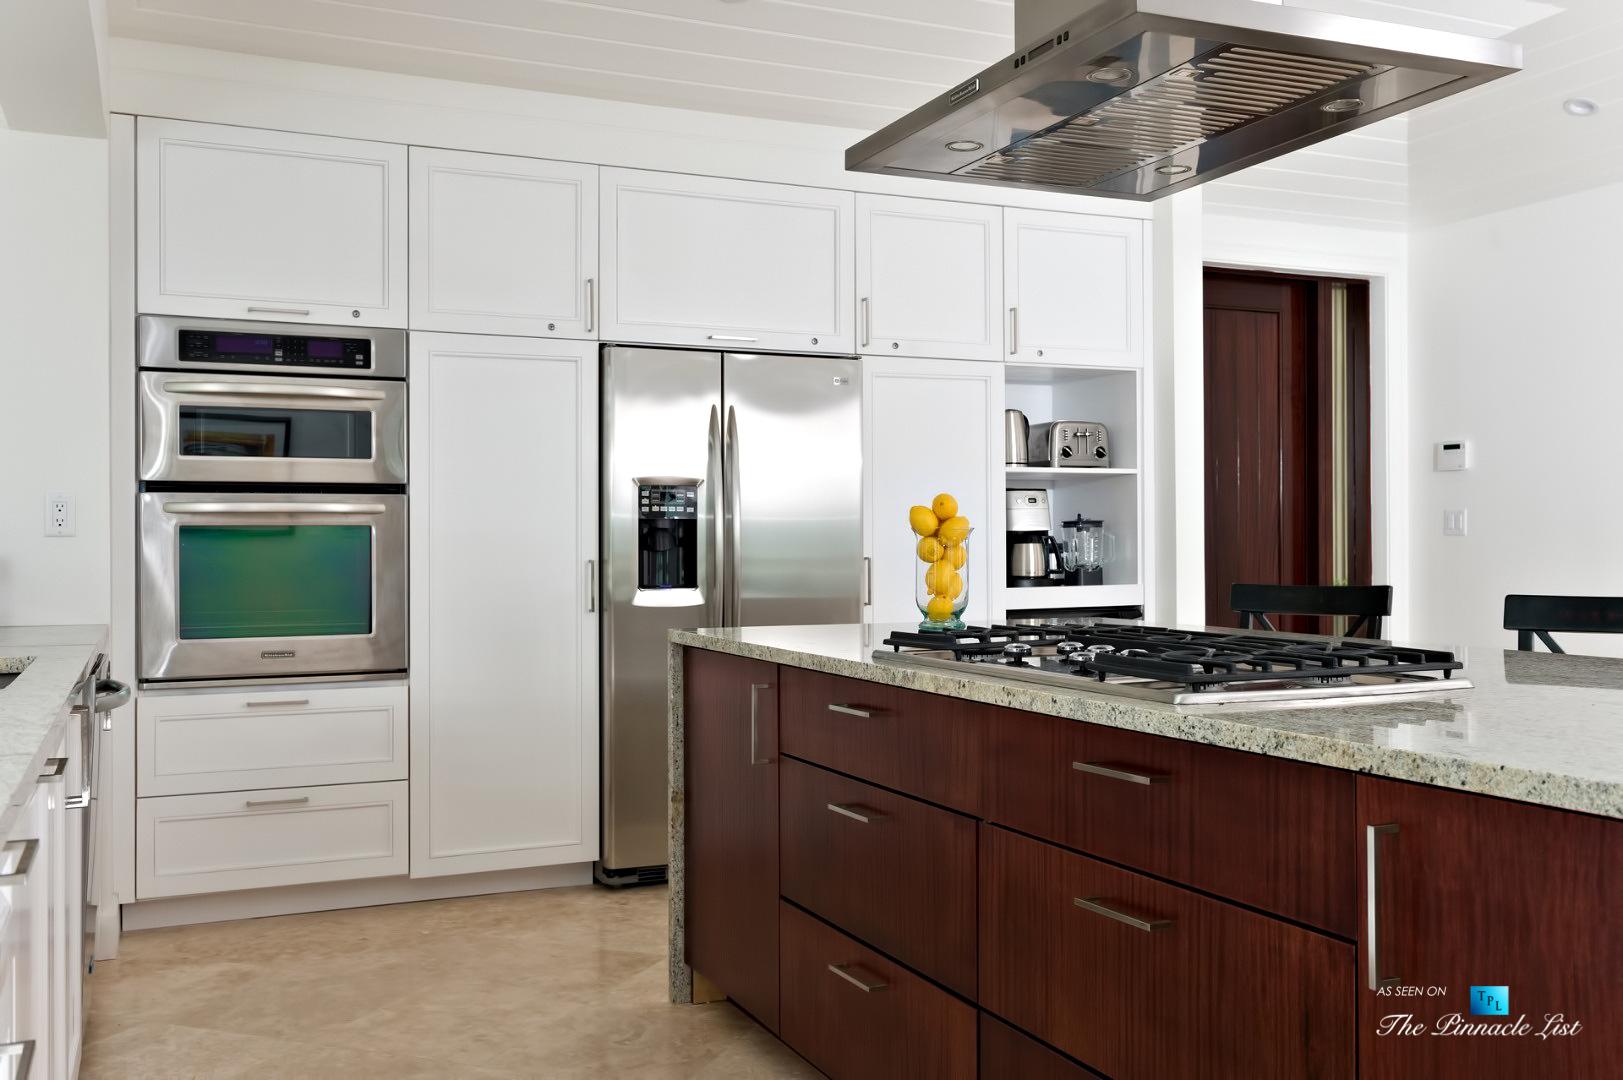 Villa Aquazure – Providenciales, Turks and Caicos Islands – Kitchen – Luxury Real Estate – Beachfront Home